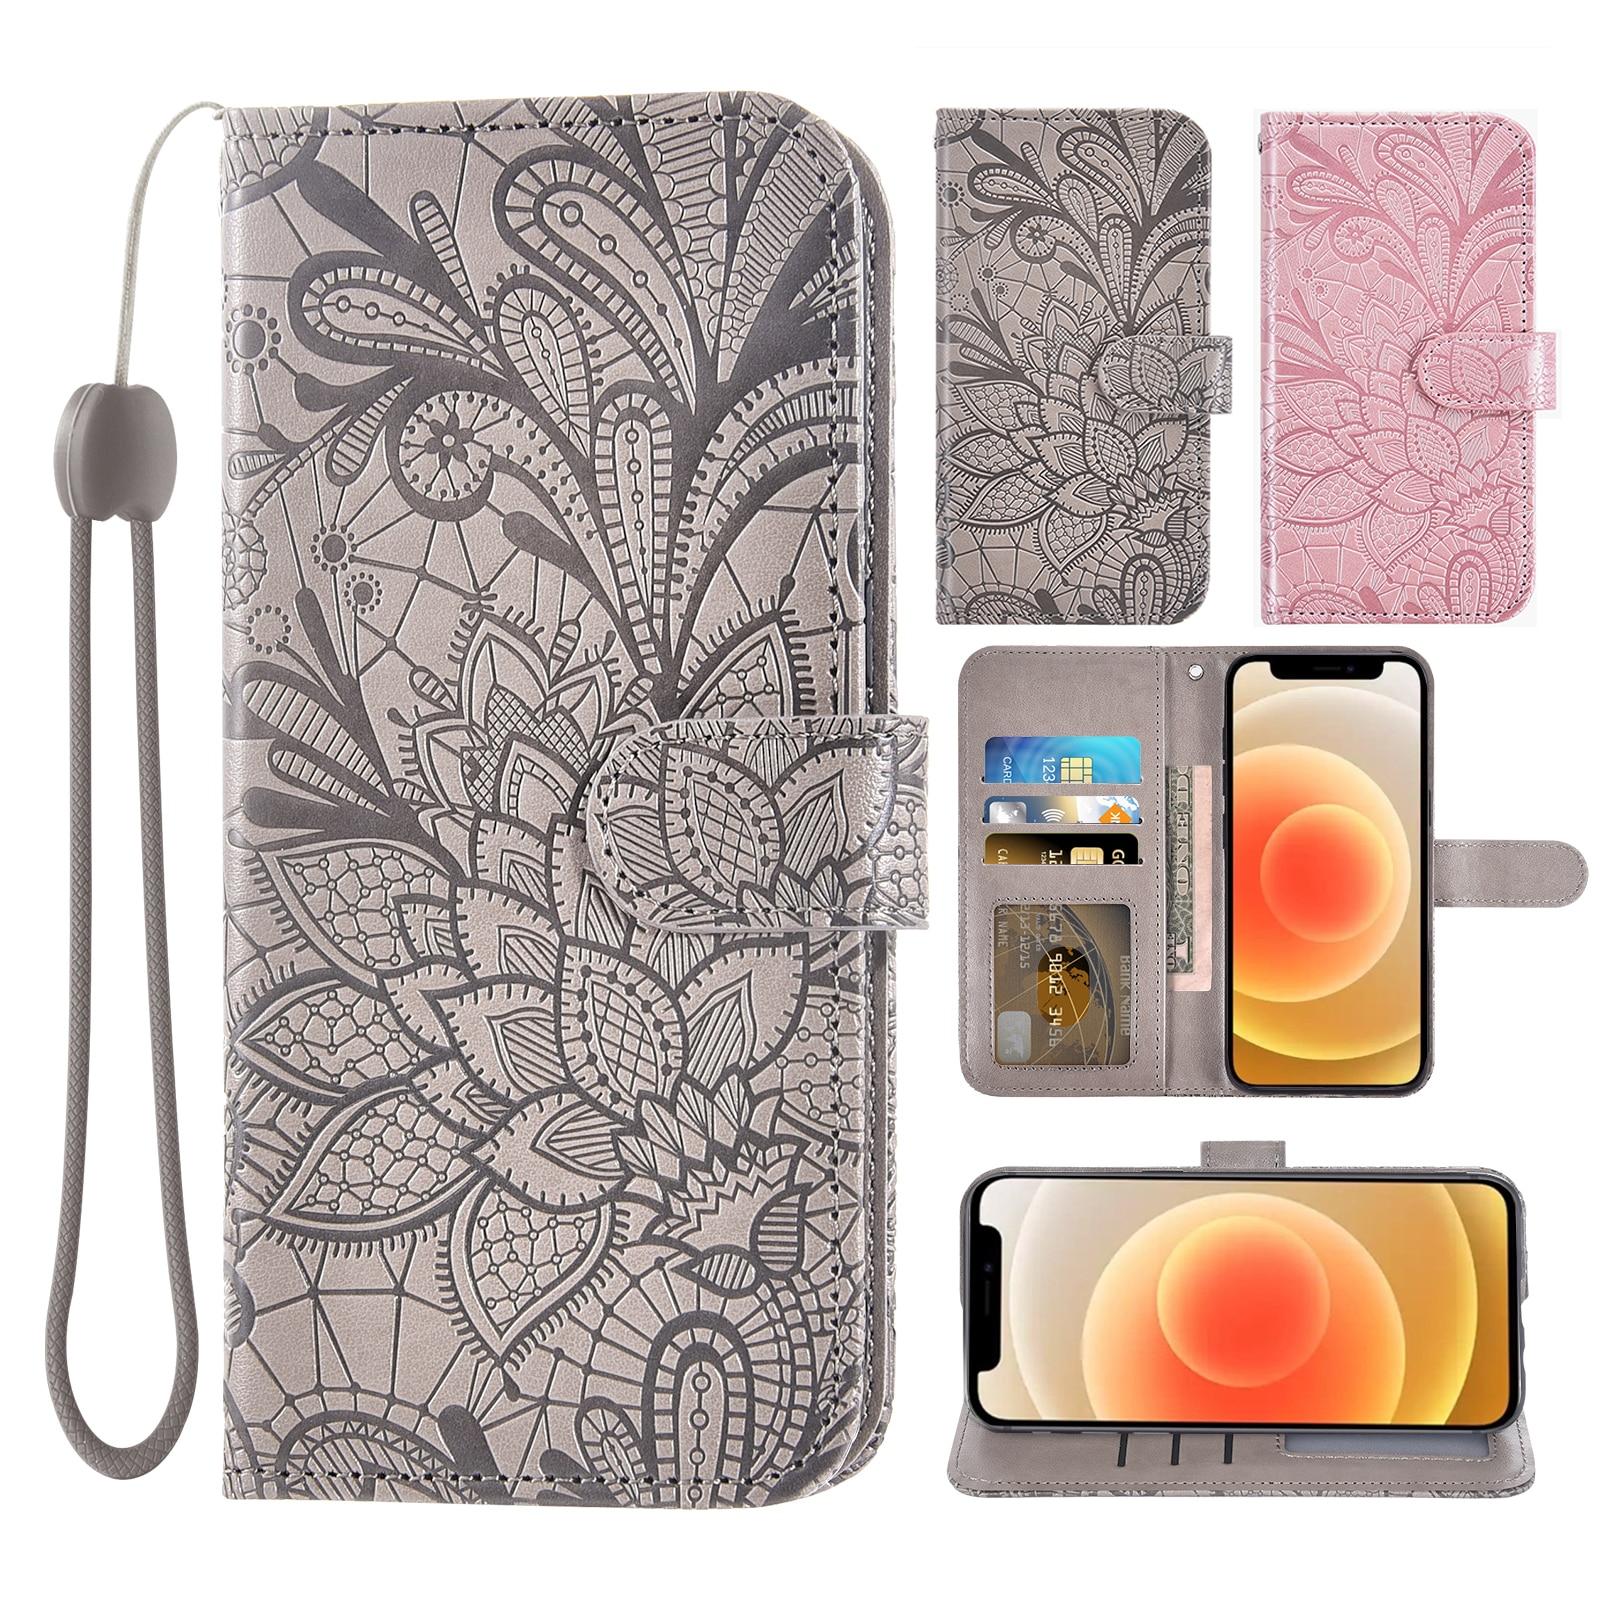 Luxury Flip Cover Leather Wallet Phone Case For Nokia G10 Nokia G20 Credit card slot wrist Women Men